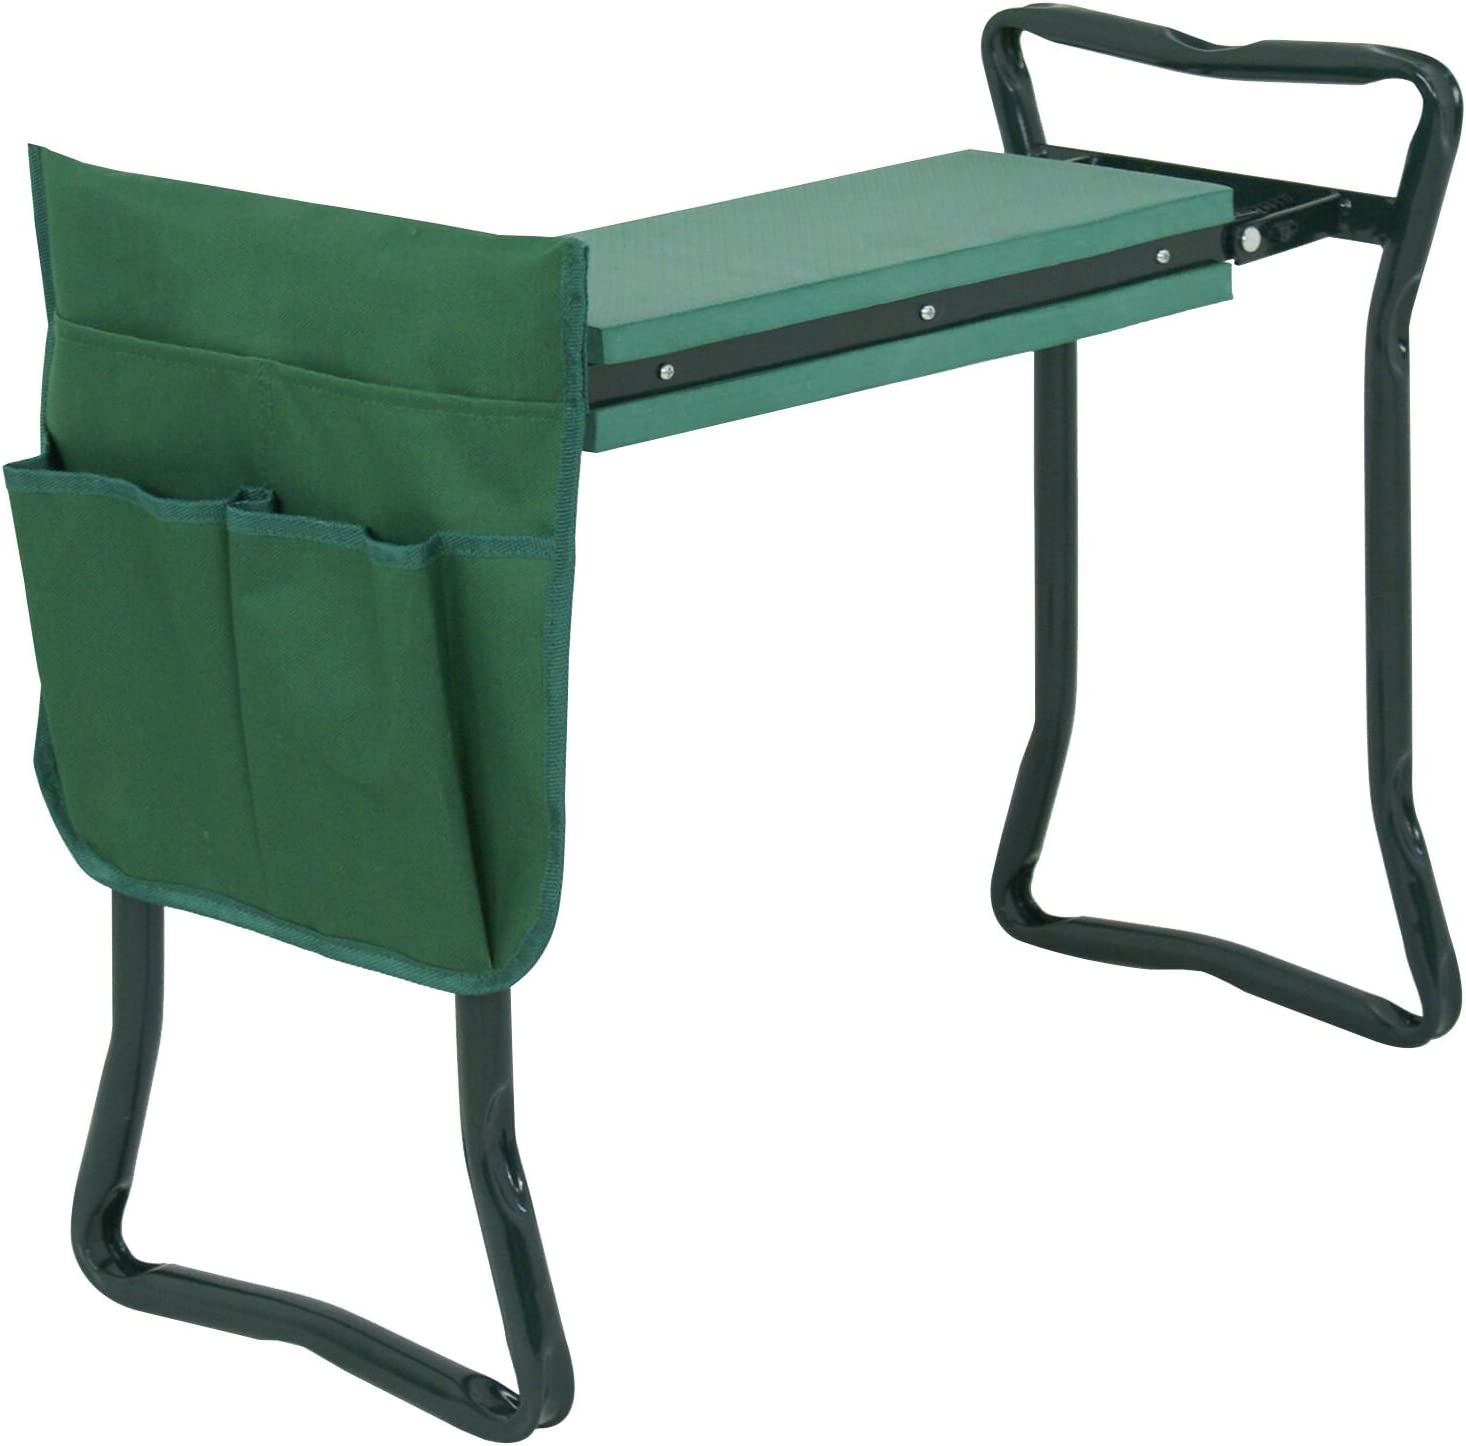 Bench Kneeling Soft Eva Pad Seat with Stool Pouch Garden Kneeler Seat Garden Bench Garden Stools Foldable Stool Pad Outdoor Portable Kneeler for Gardening LOYALHEARTDY Folding Garden Kneeler